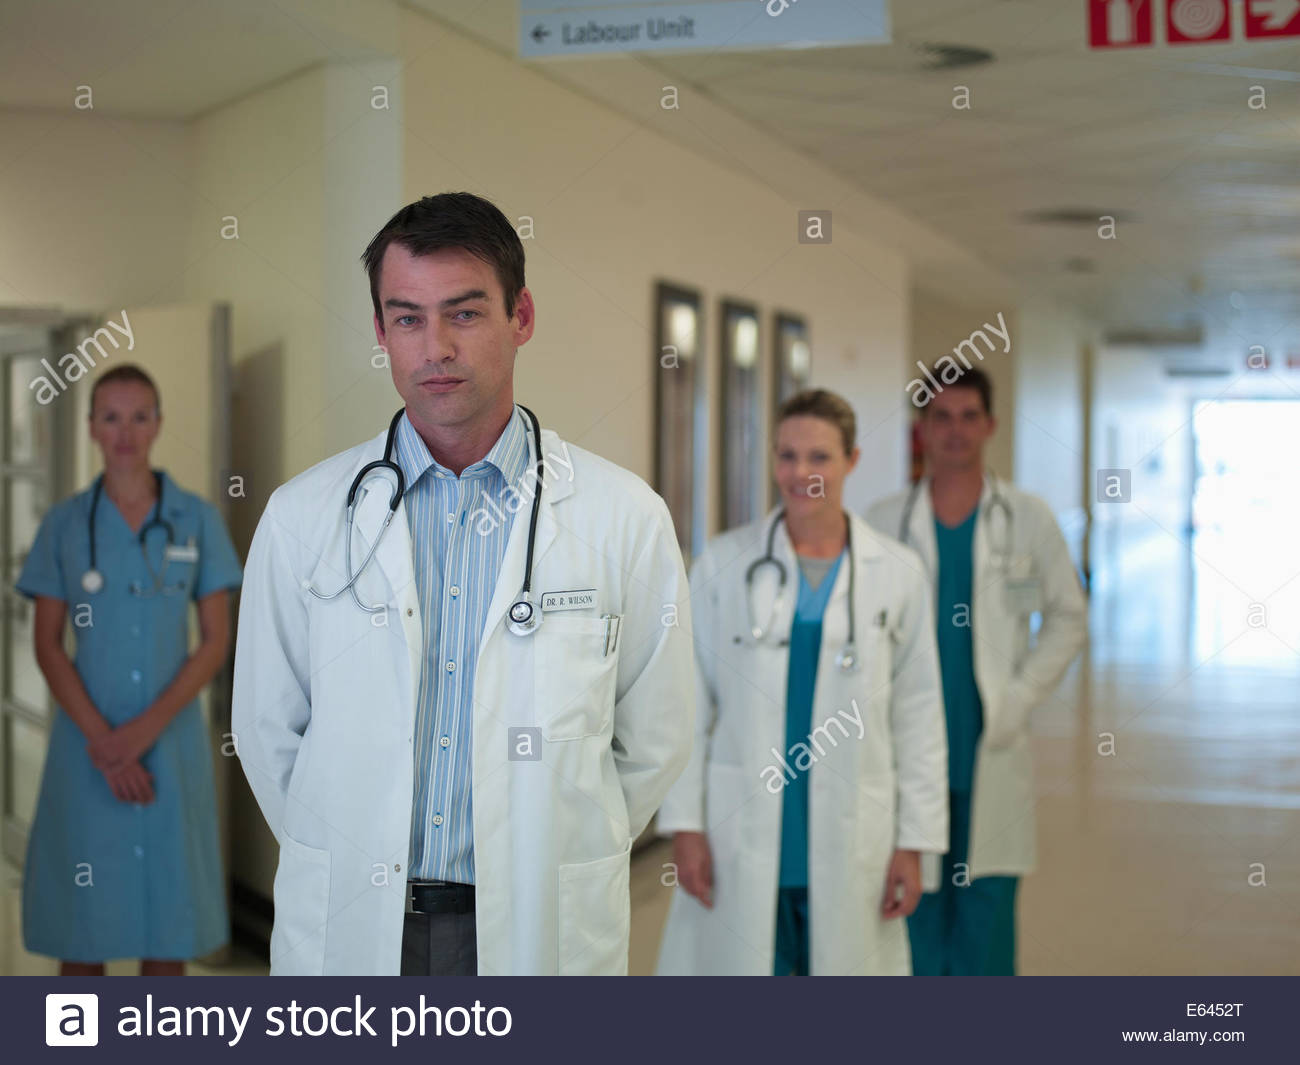 Doctors and nurse standing in hospital corridor - Stock Image